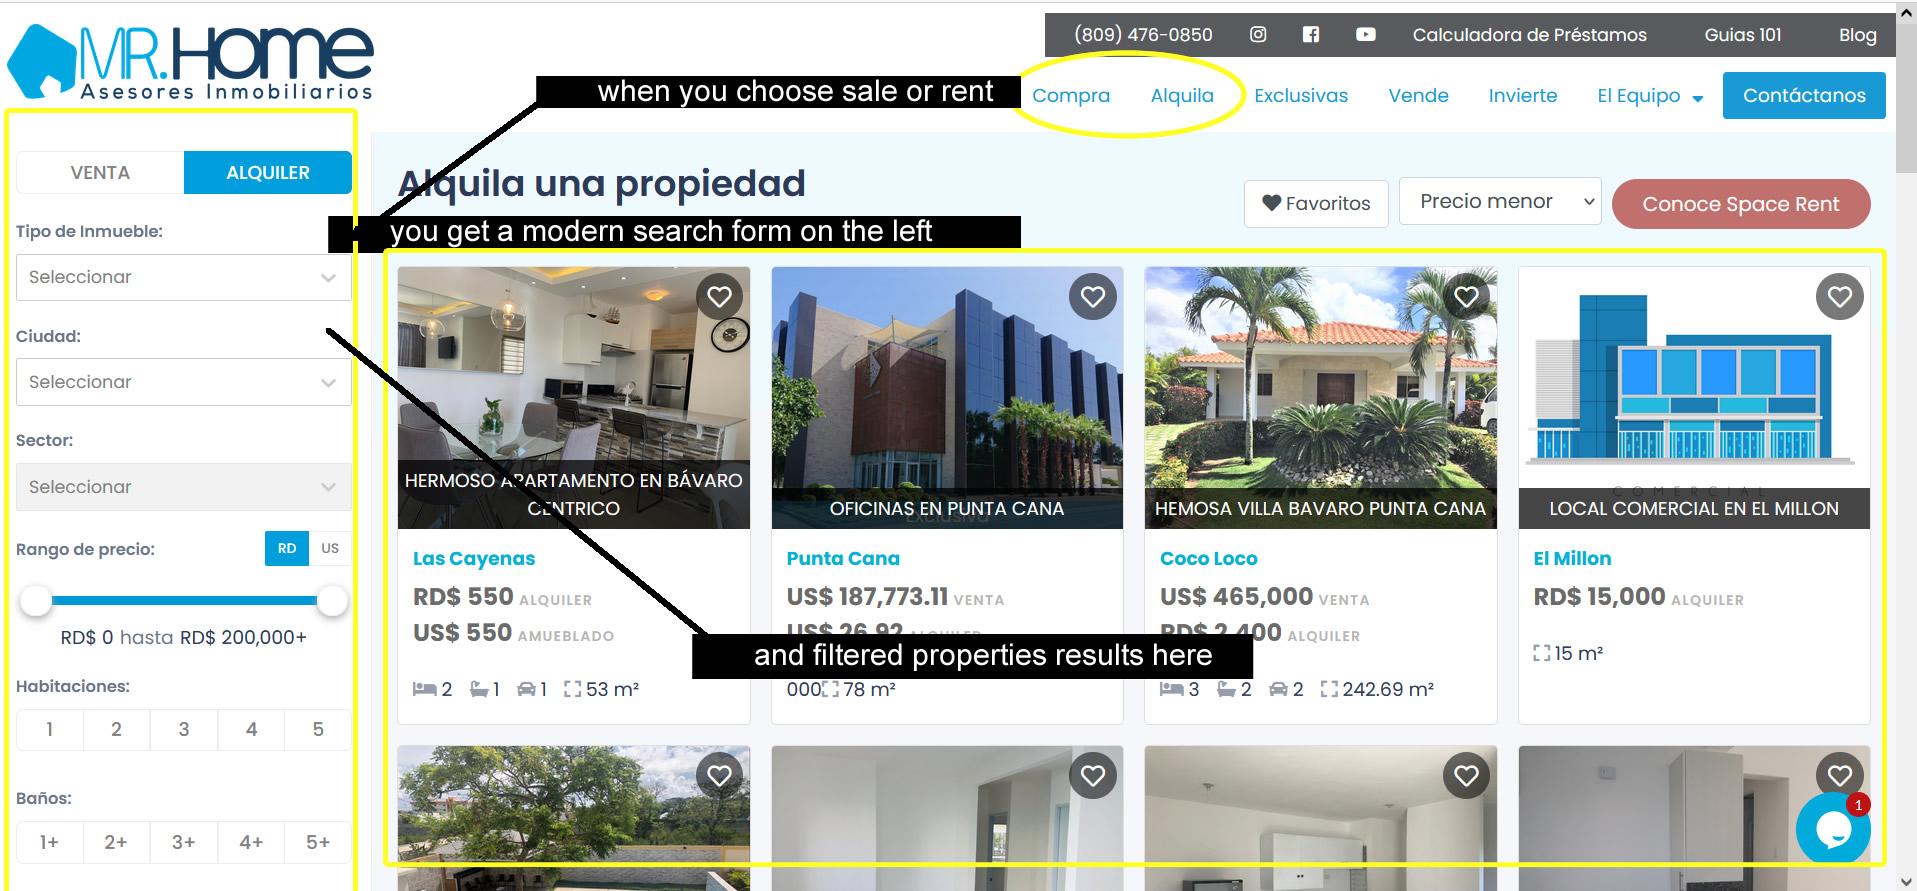 mr-home-listing-page-likes.jpg